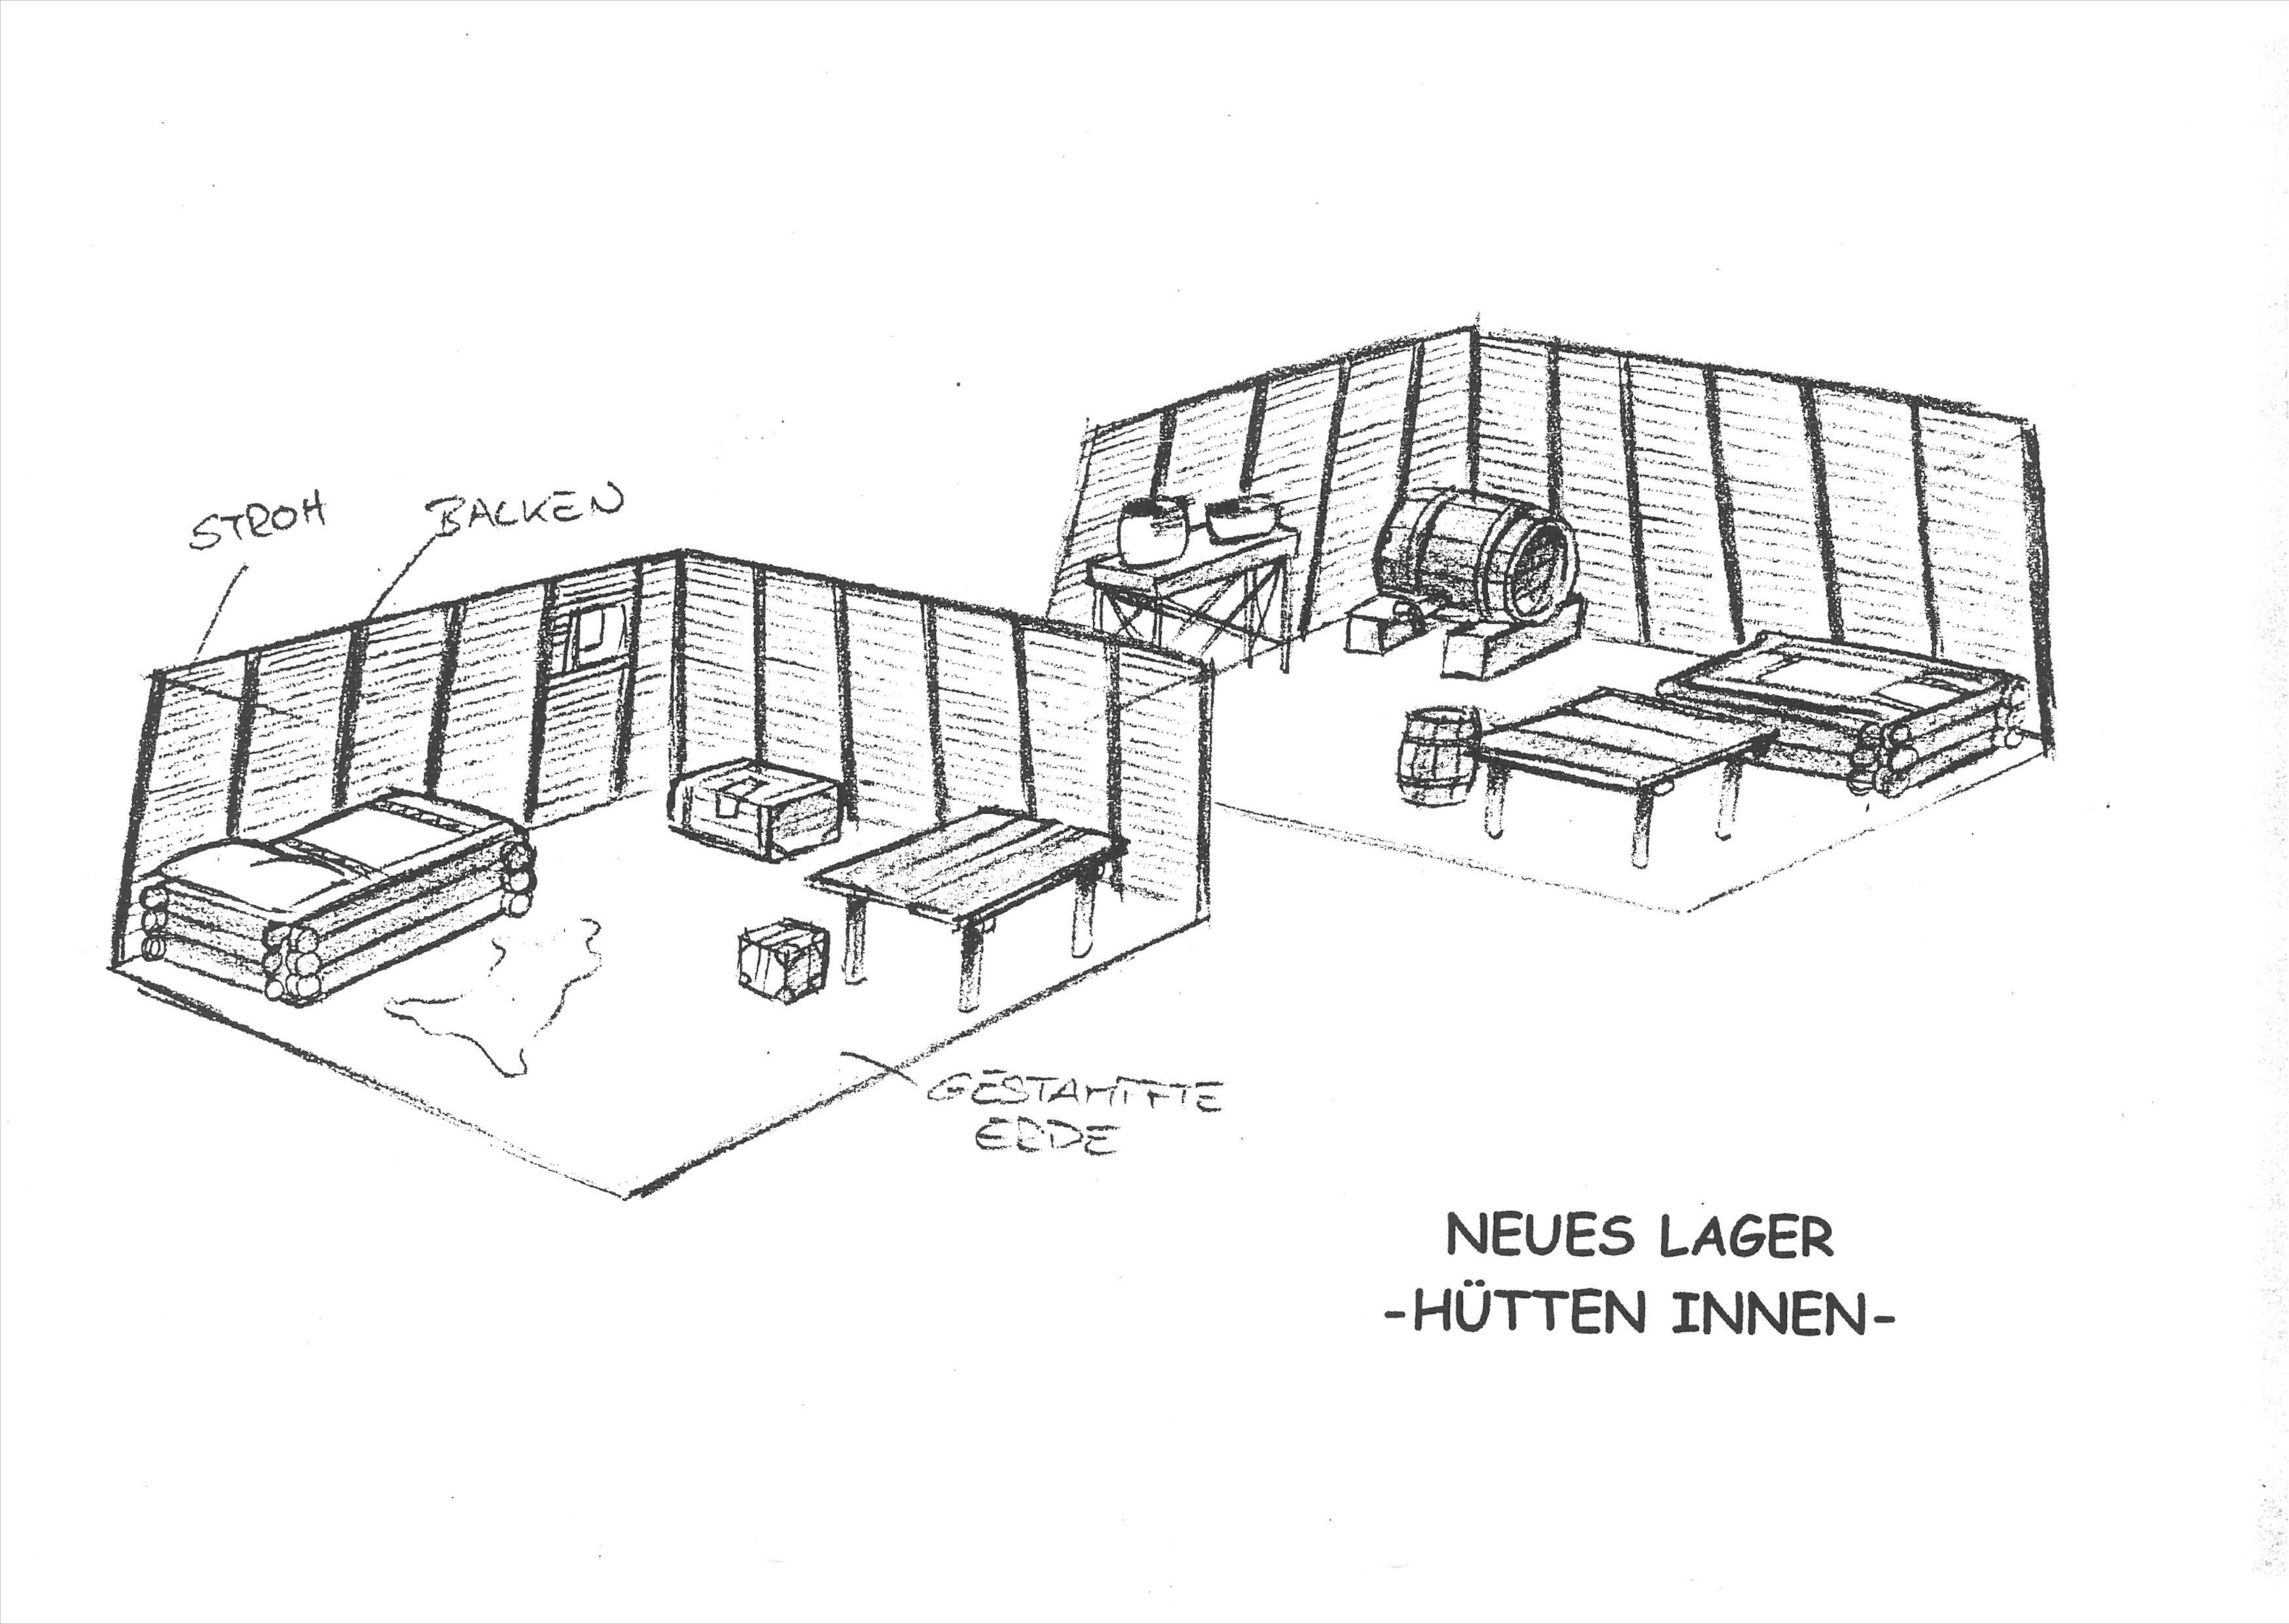 Neues Lager - Hütten Innen